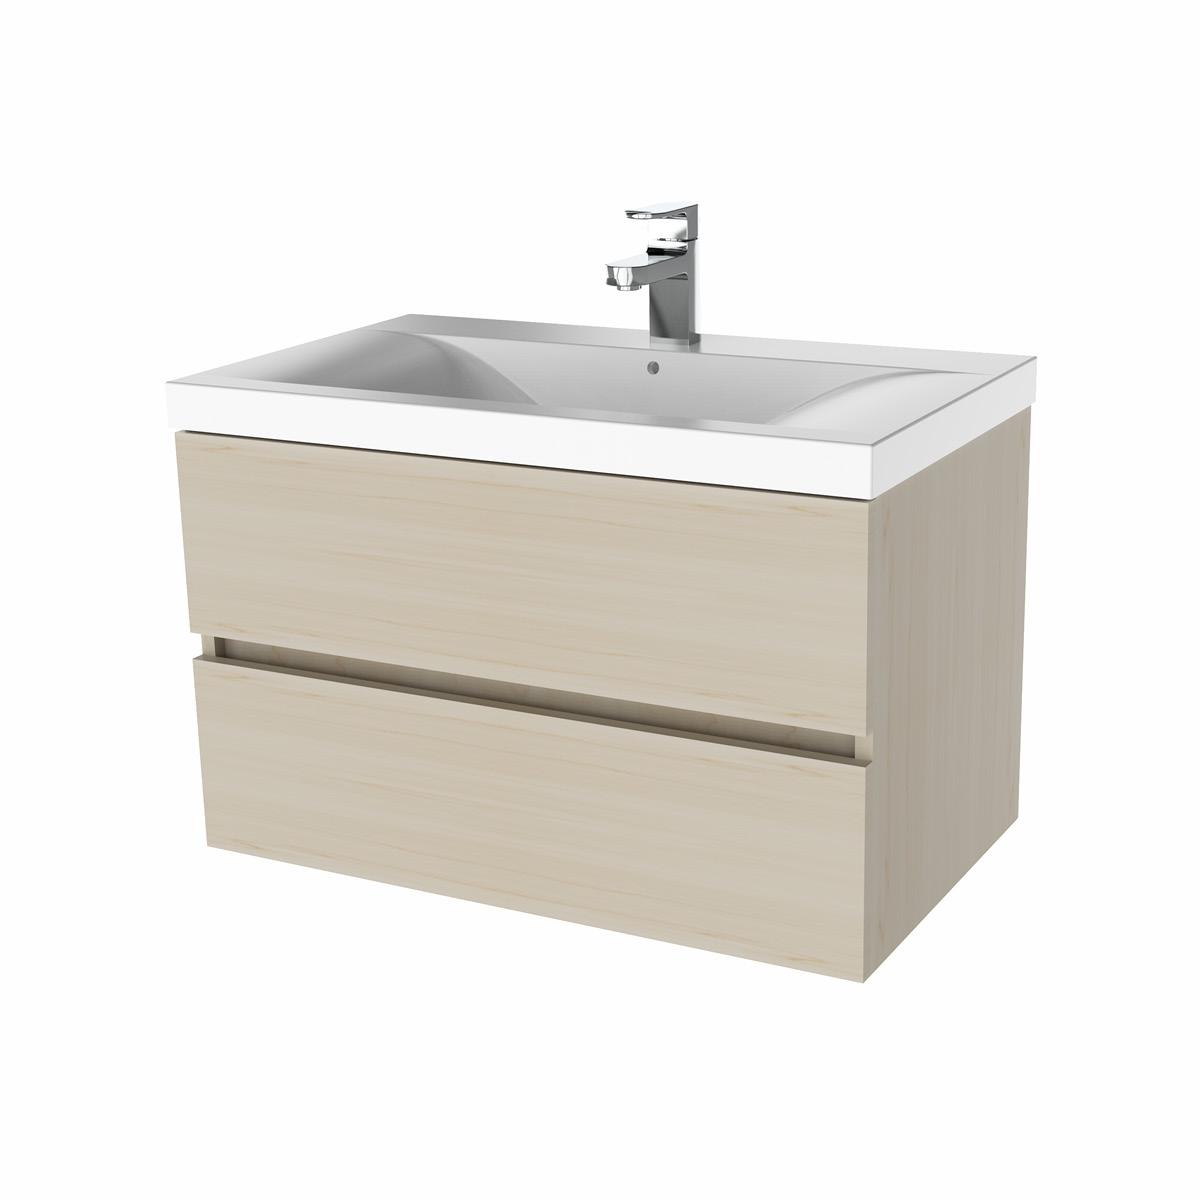 Paris waschtisch set 80 cm kernahorn badewelt badezimmer m bel for Badezimmer waschtisch set